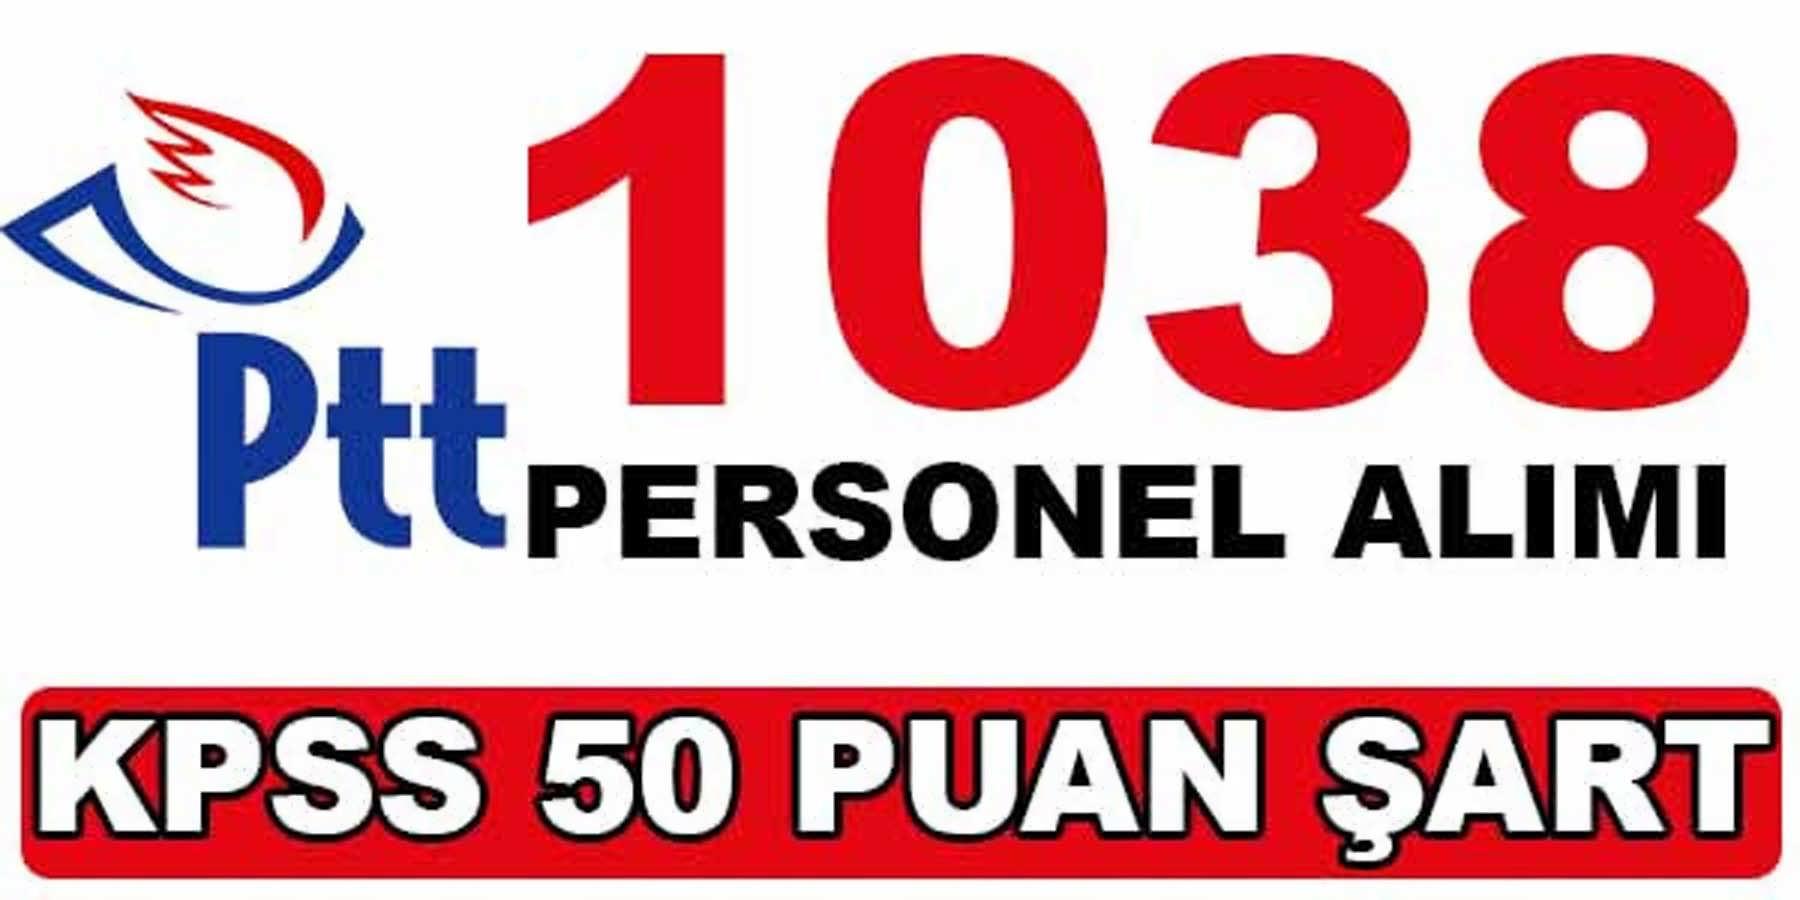 PTT 1038 Personel Alımı 28 Nisan 2016